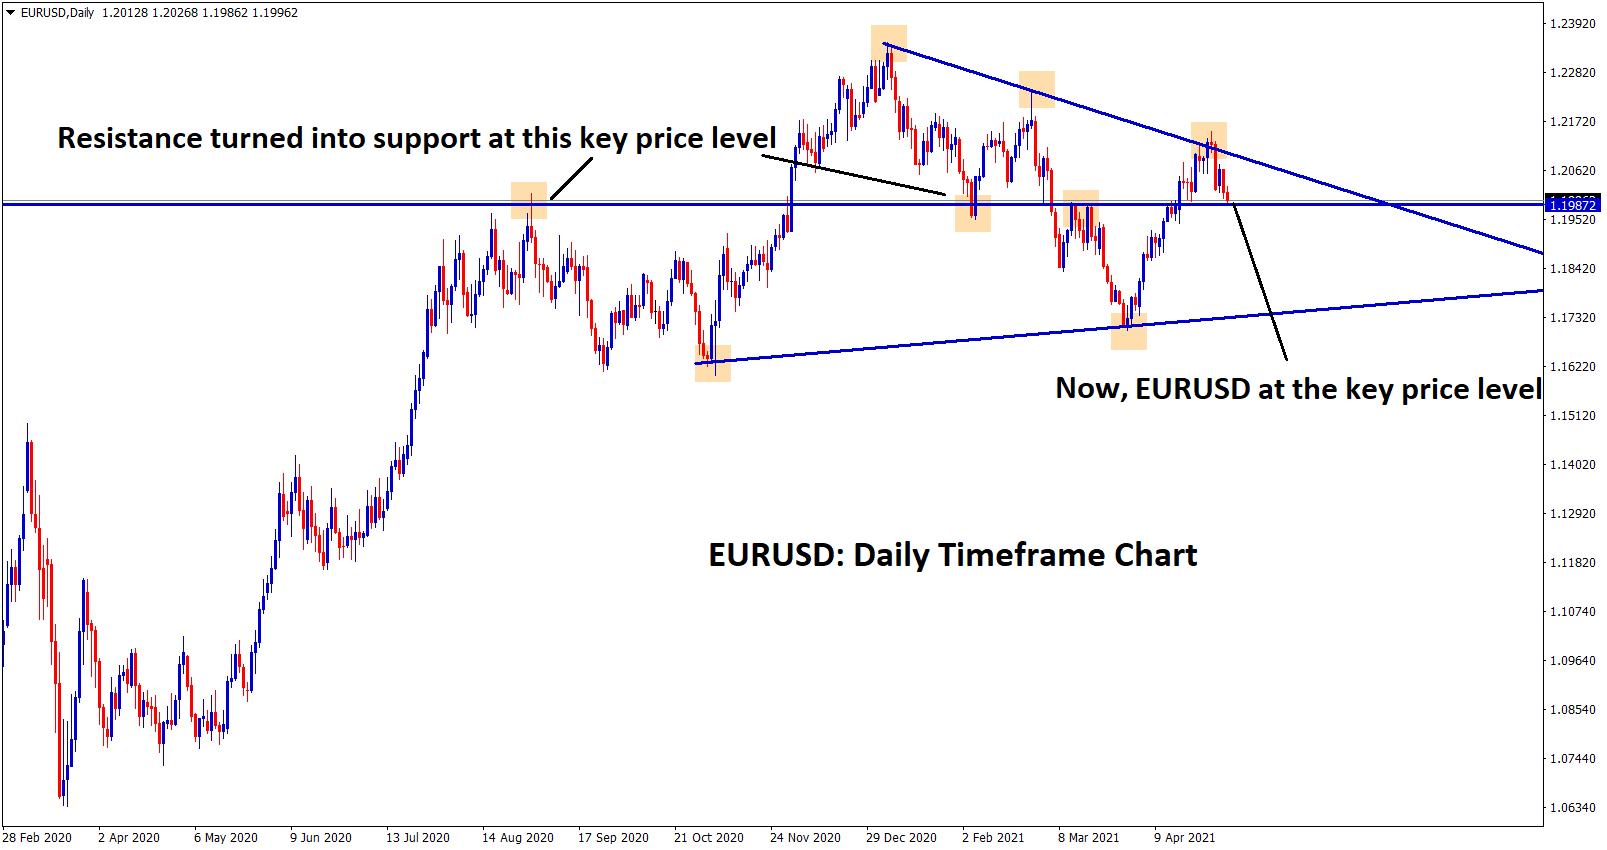 eurusd at the key price level now